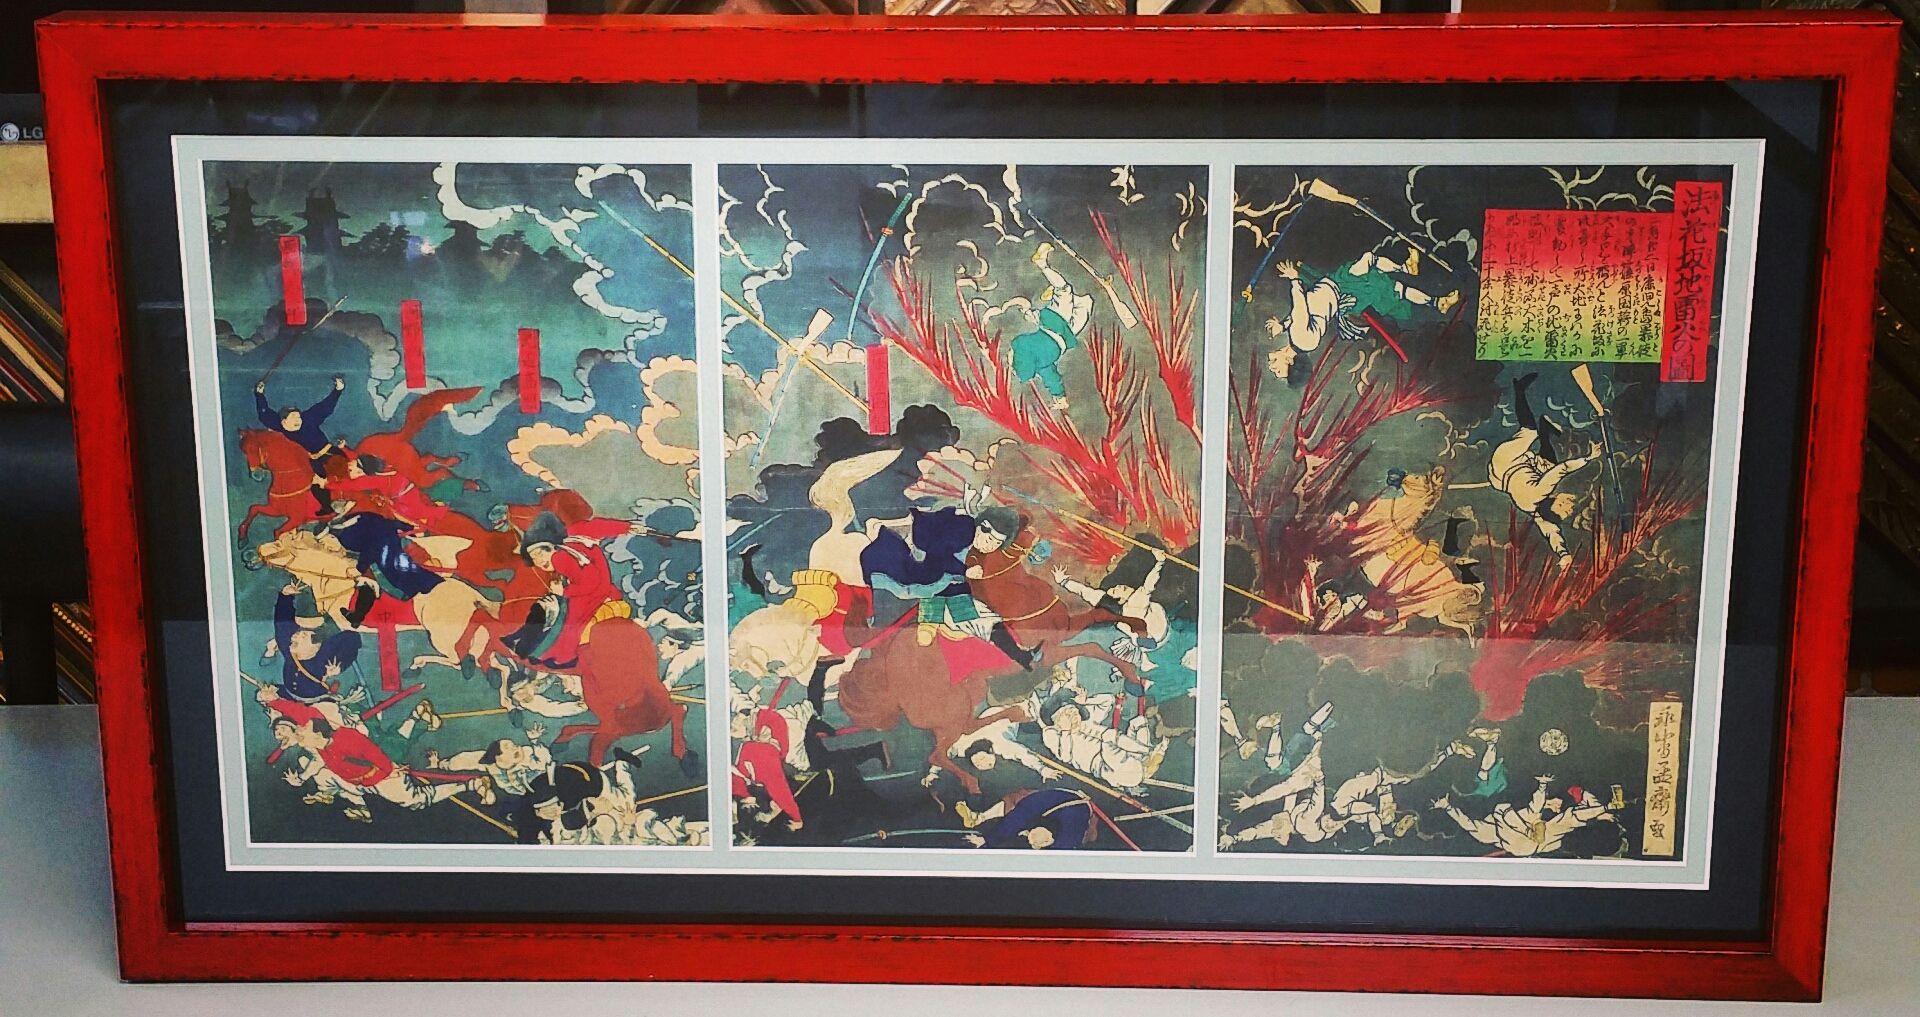 Vintage Asian Triptych Framed With Linen Matting Conservation Glass And Larsonjuhl S Komodo Art Pictureframing Cu Art Framing Photography Framed Artwork